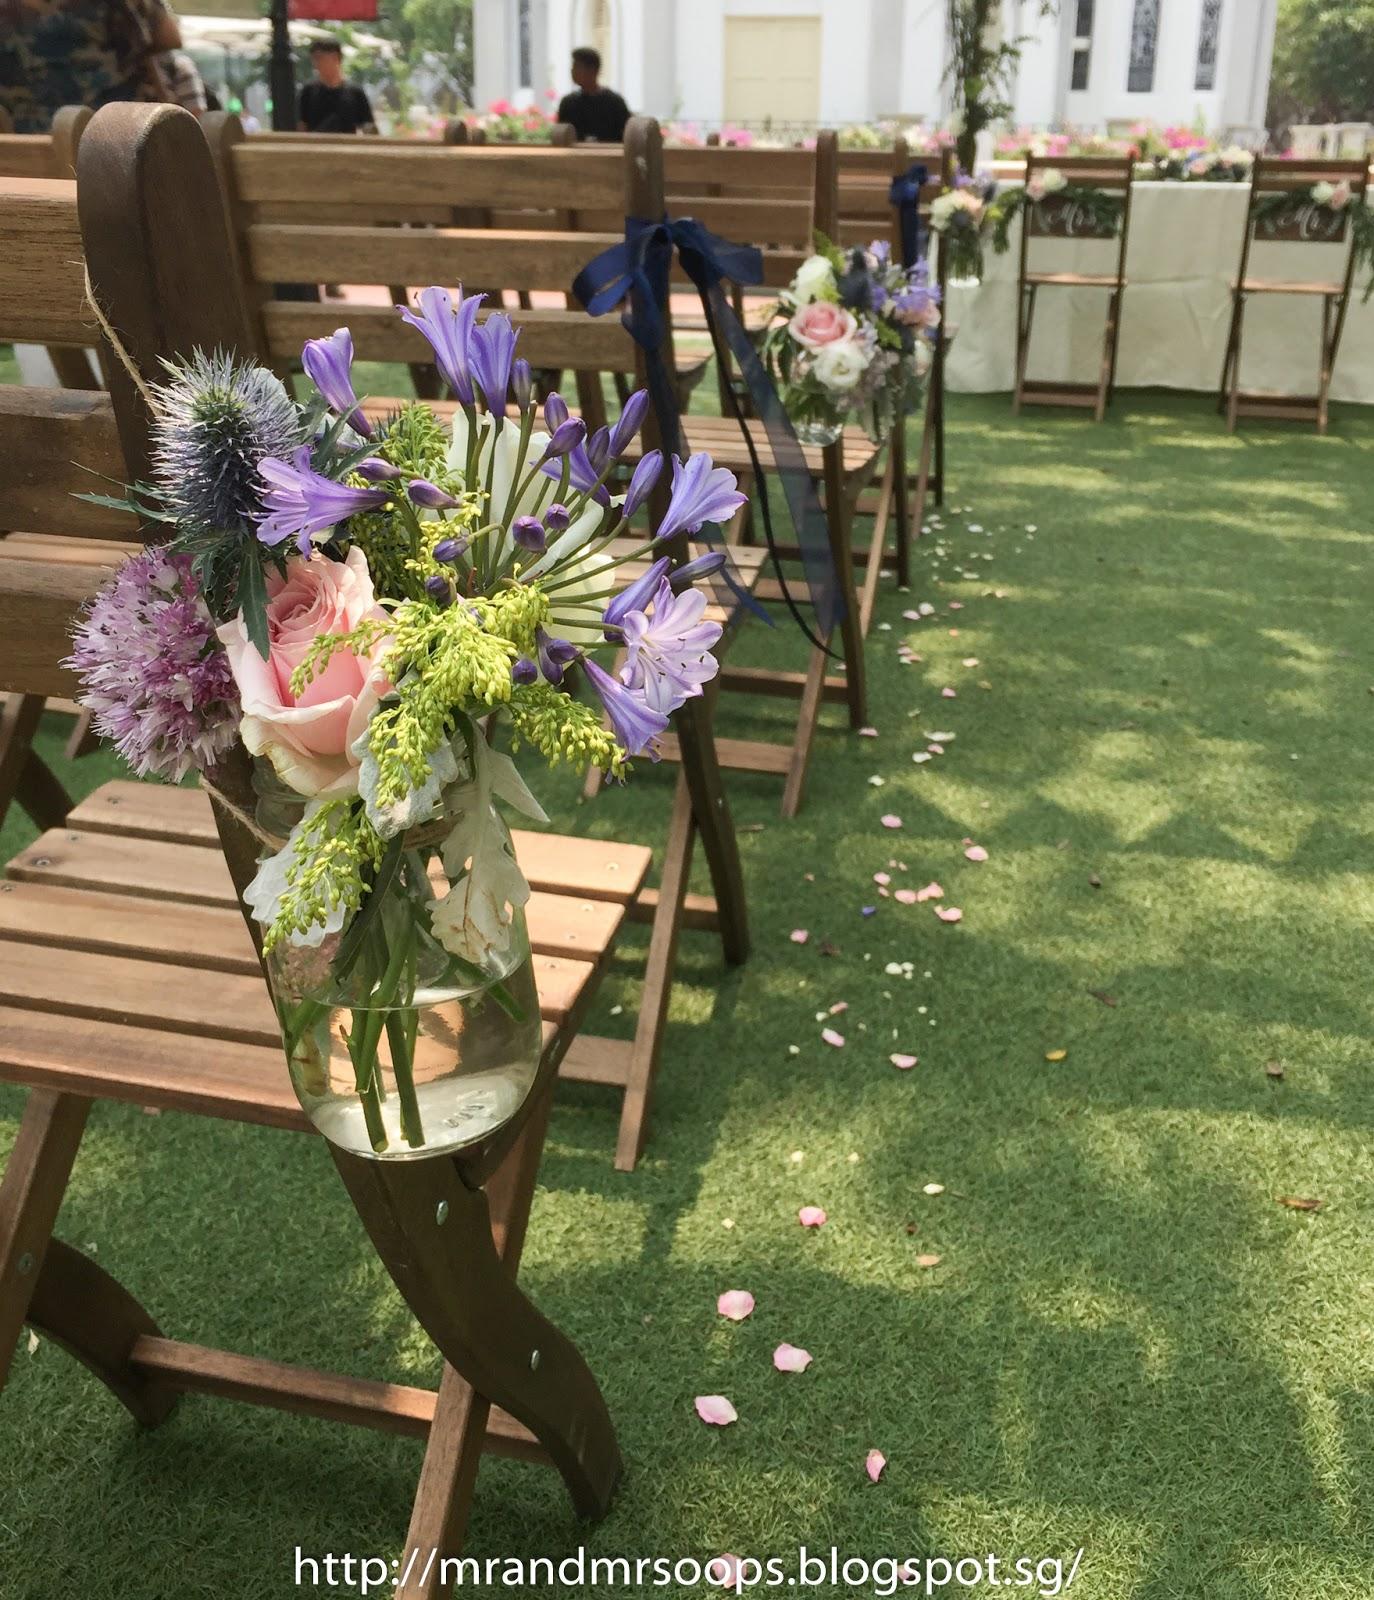 Alternative Wedding Venues Singapore: Review: The Wedding Chijmes By Chijmes Hall Singapore